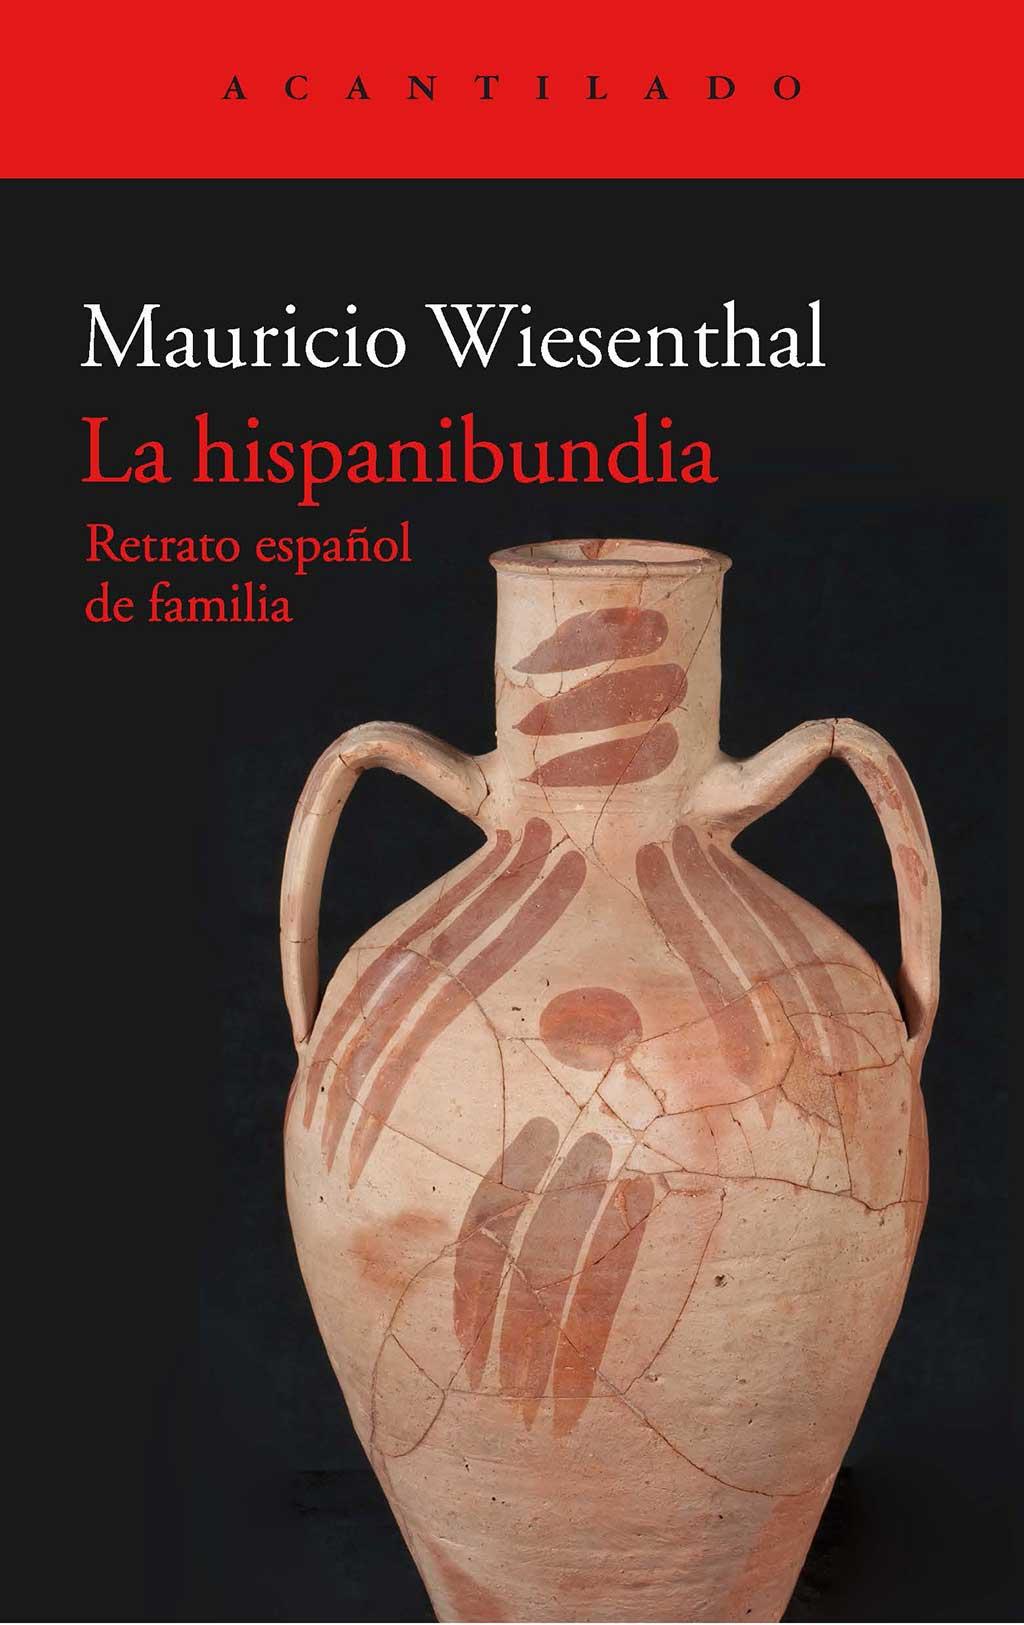 La hispanibundia. Mauricio Wiesenthal